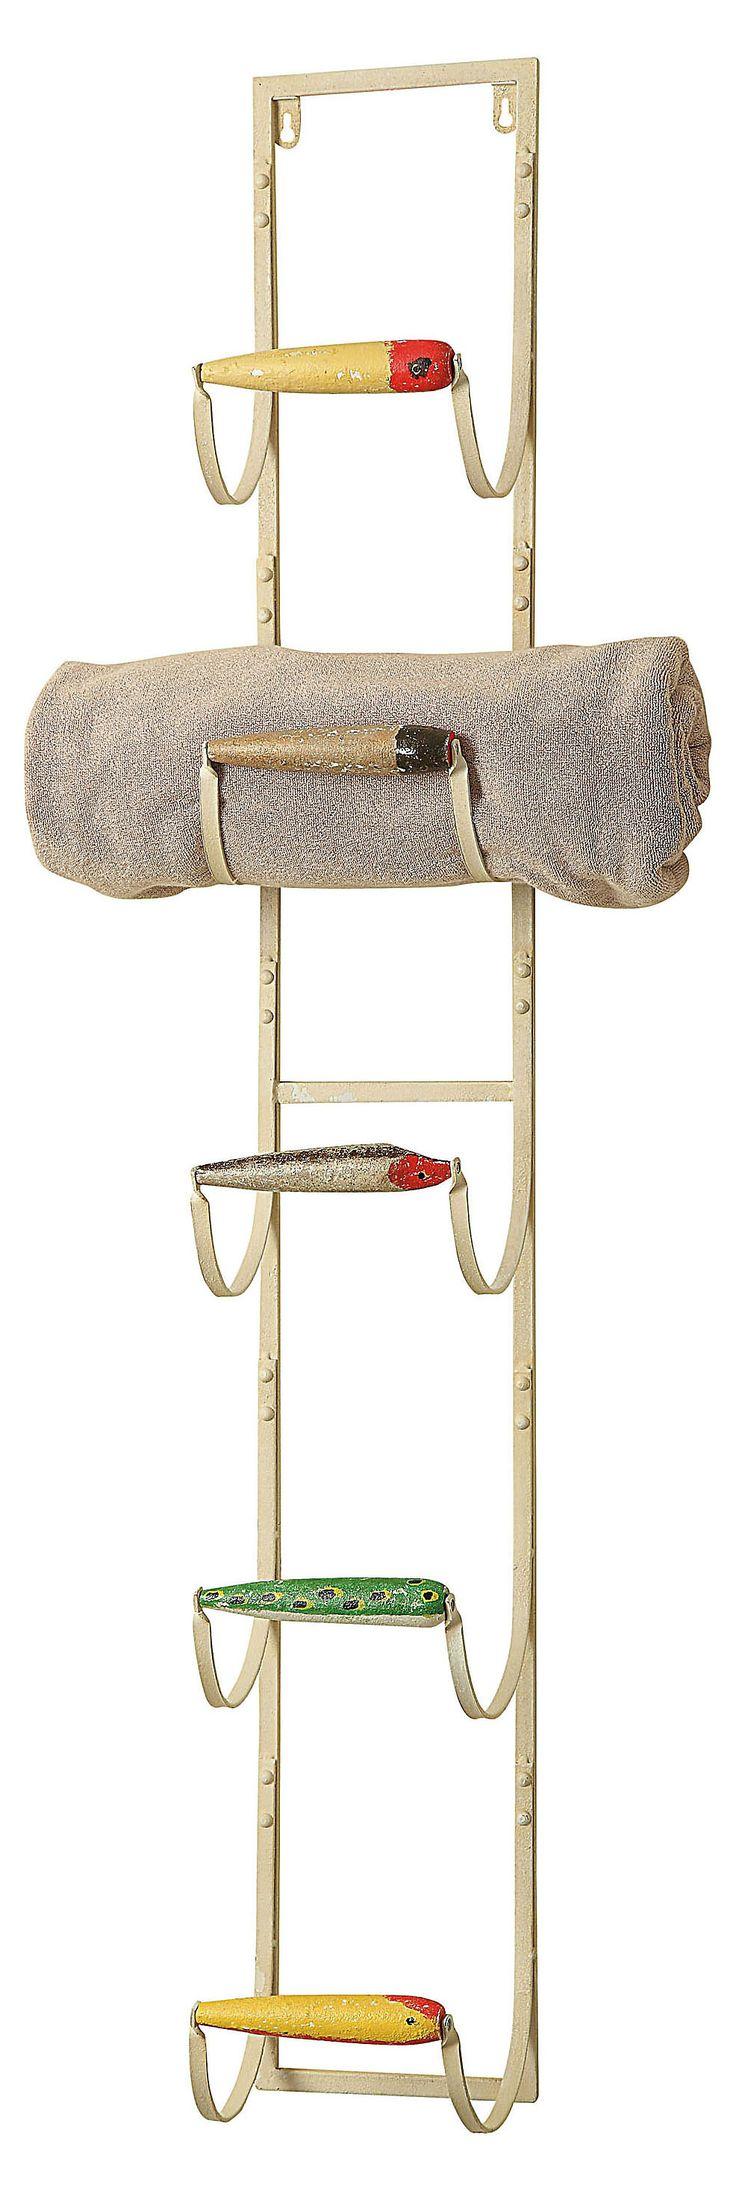 1000 ideas about outdoor towel racks on pinterest outdoor towel racks towel rack pool and. Black Bedroom Furniture Sets. Home Design Ideas